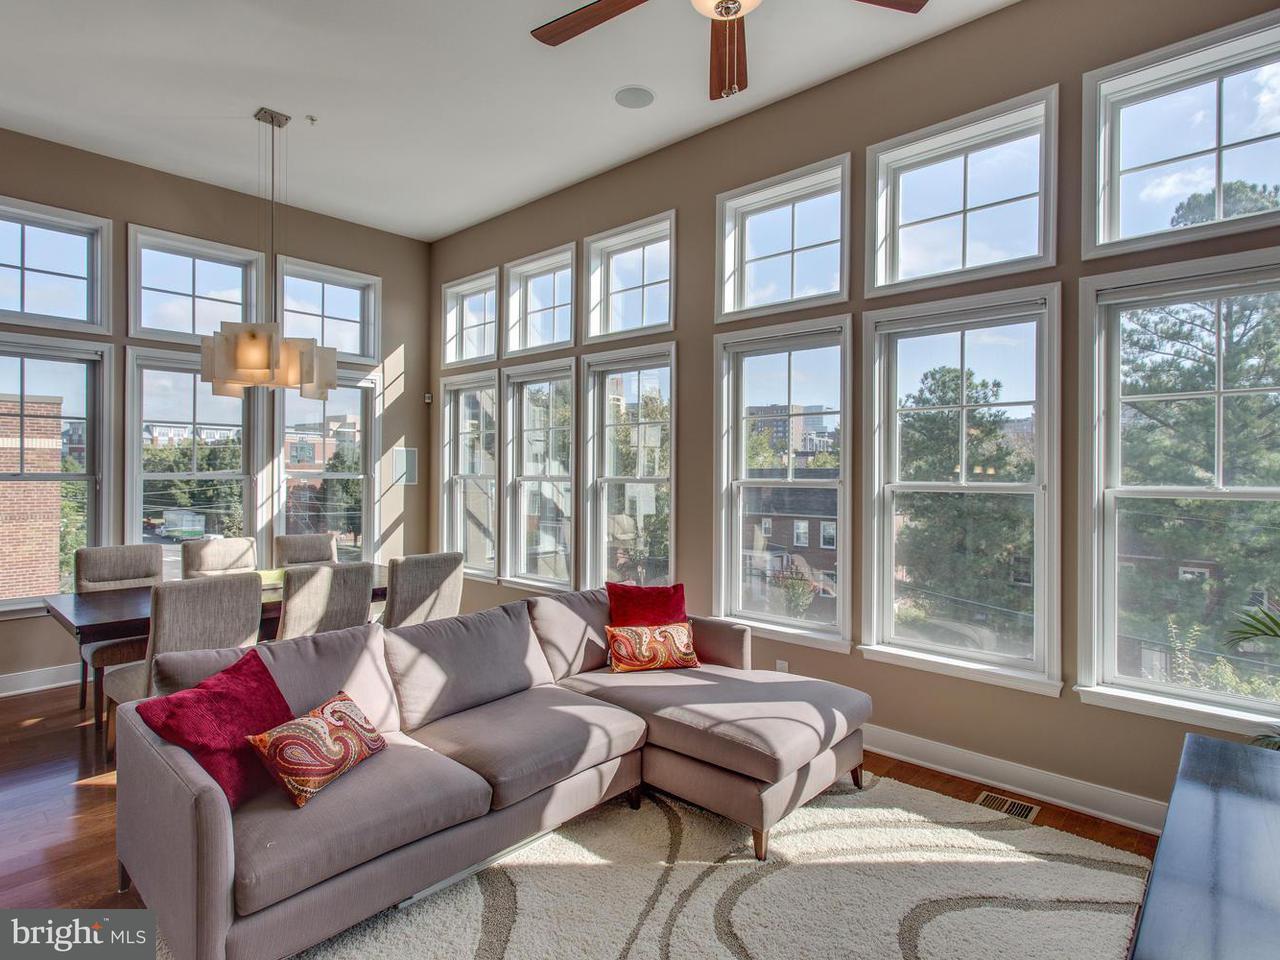 Condominium for Sale at 1418 RHODES ST #B408 1418 RHODES ST #B408 Arlington, Virginia 22209 United States